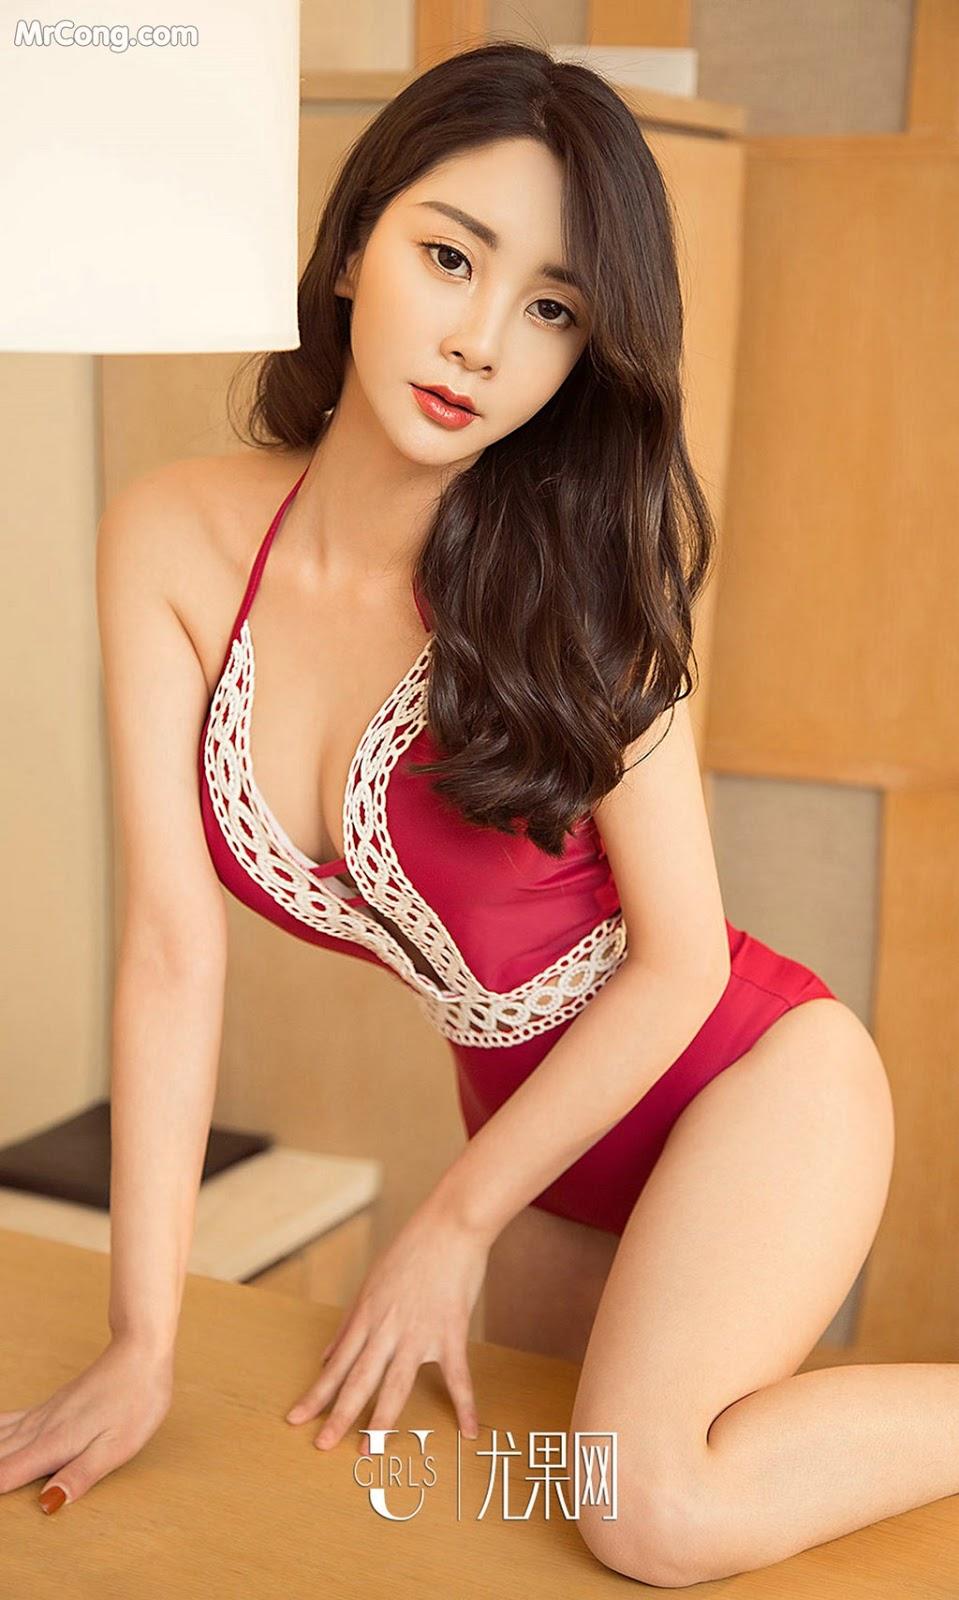 Image UGIRLS-Ai-You-Wu-App-No.1389-Lucy-MrCong.com-006 in post UGIRLS – Ai You Wu App No.1389: Người mẫu Lucy (35 ảnh)